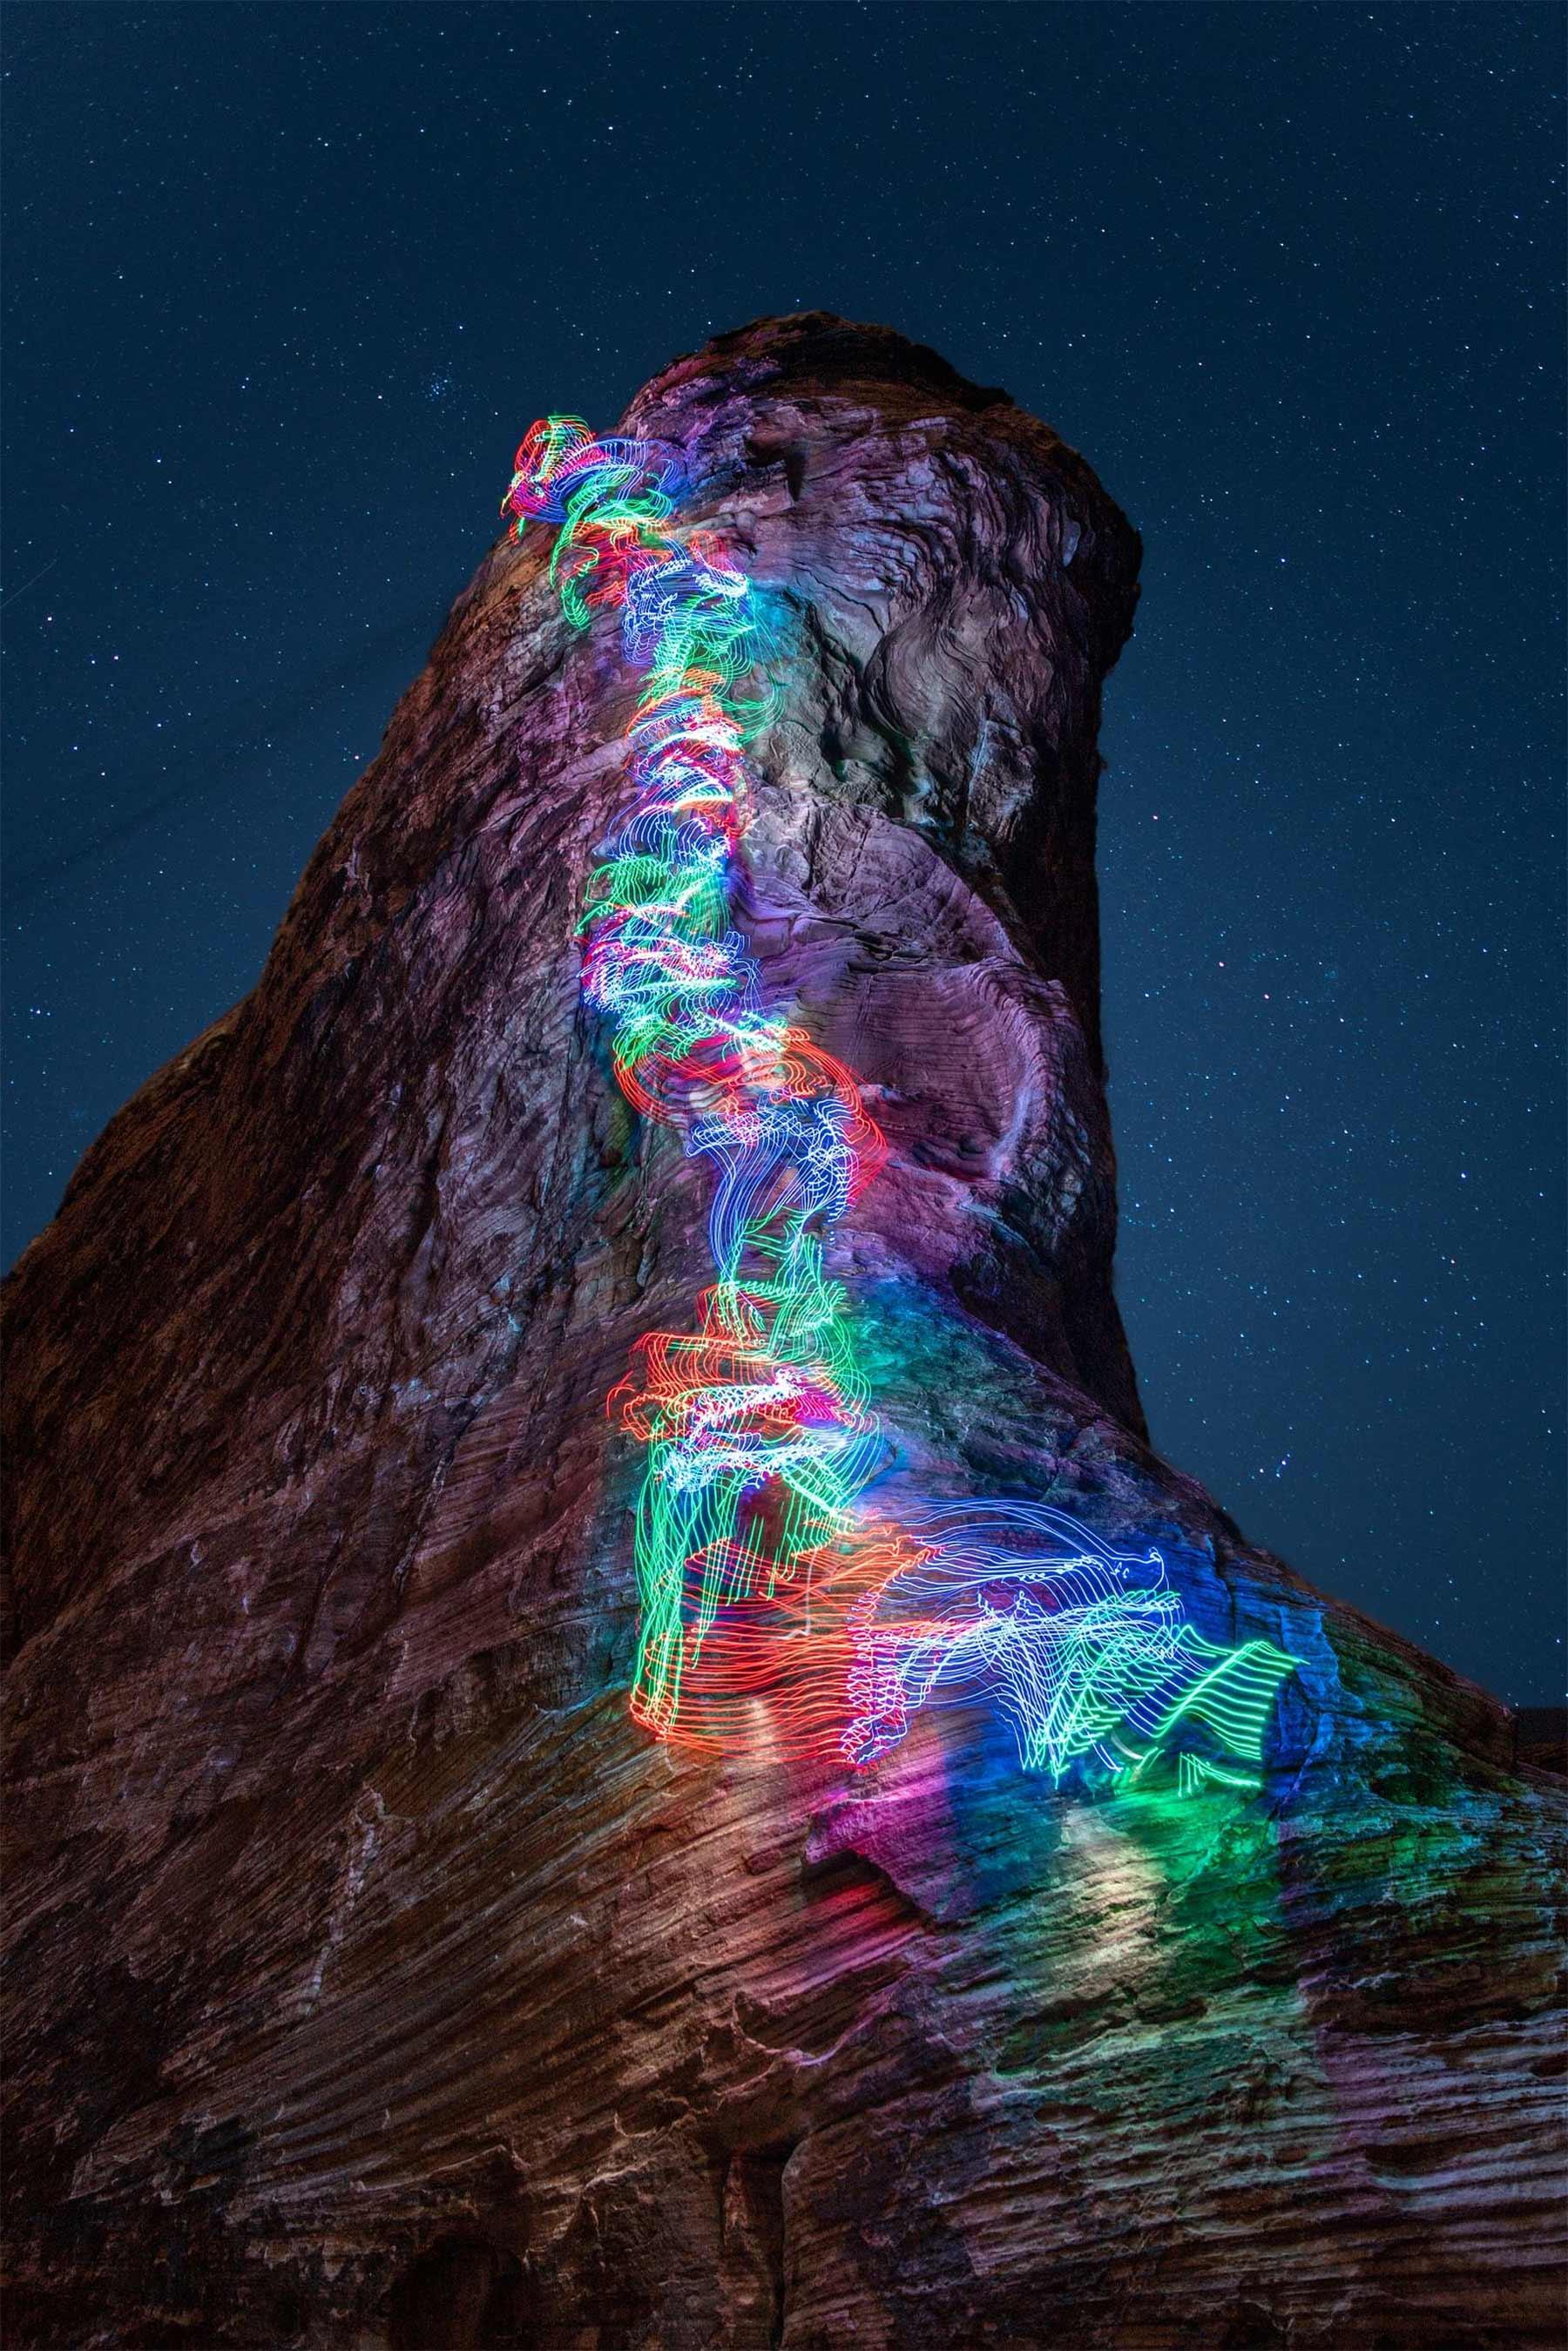 Leuchtende Kletterrouten leuchtende-kletterrouten-Luke-Rasmussen_02